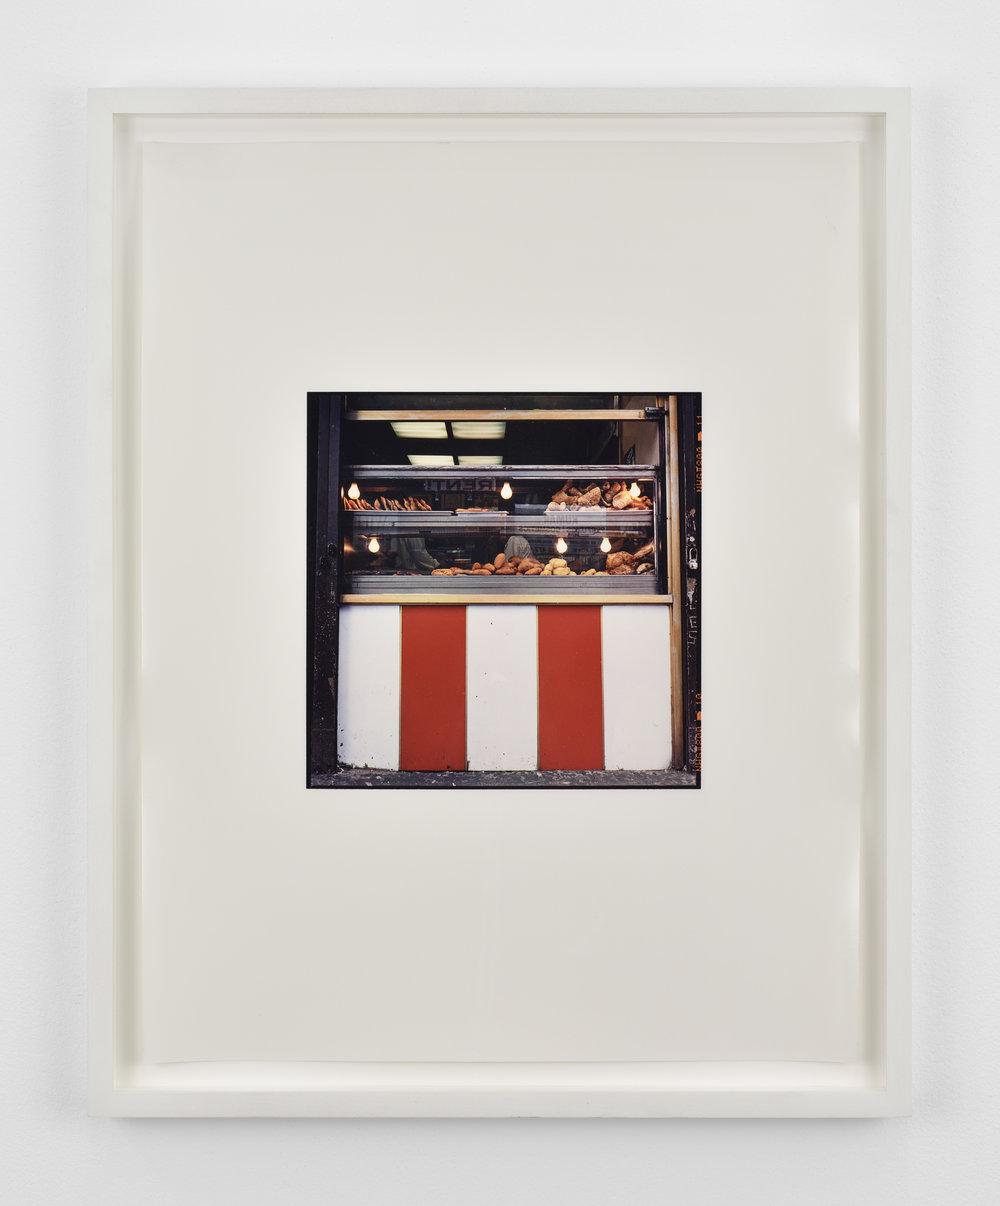 Zoe Leonard Red & White Restaurant, 1999/2001 dye transfer print 22 x 18 in (55,9 x 45,7 cm) Edition of 6